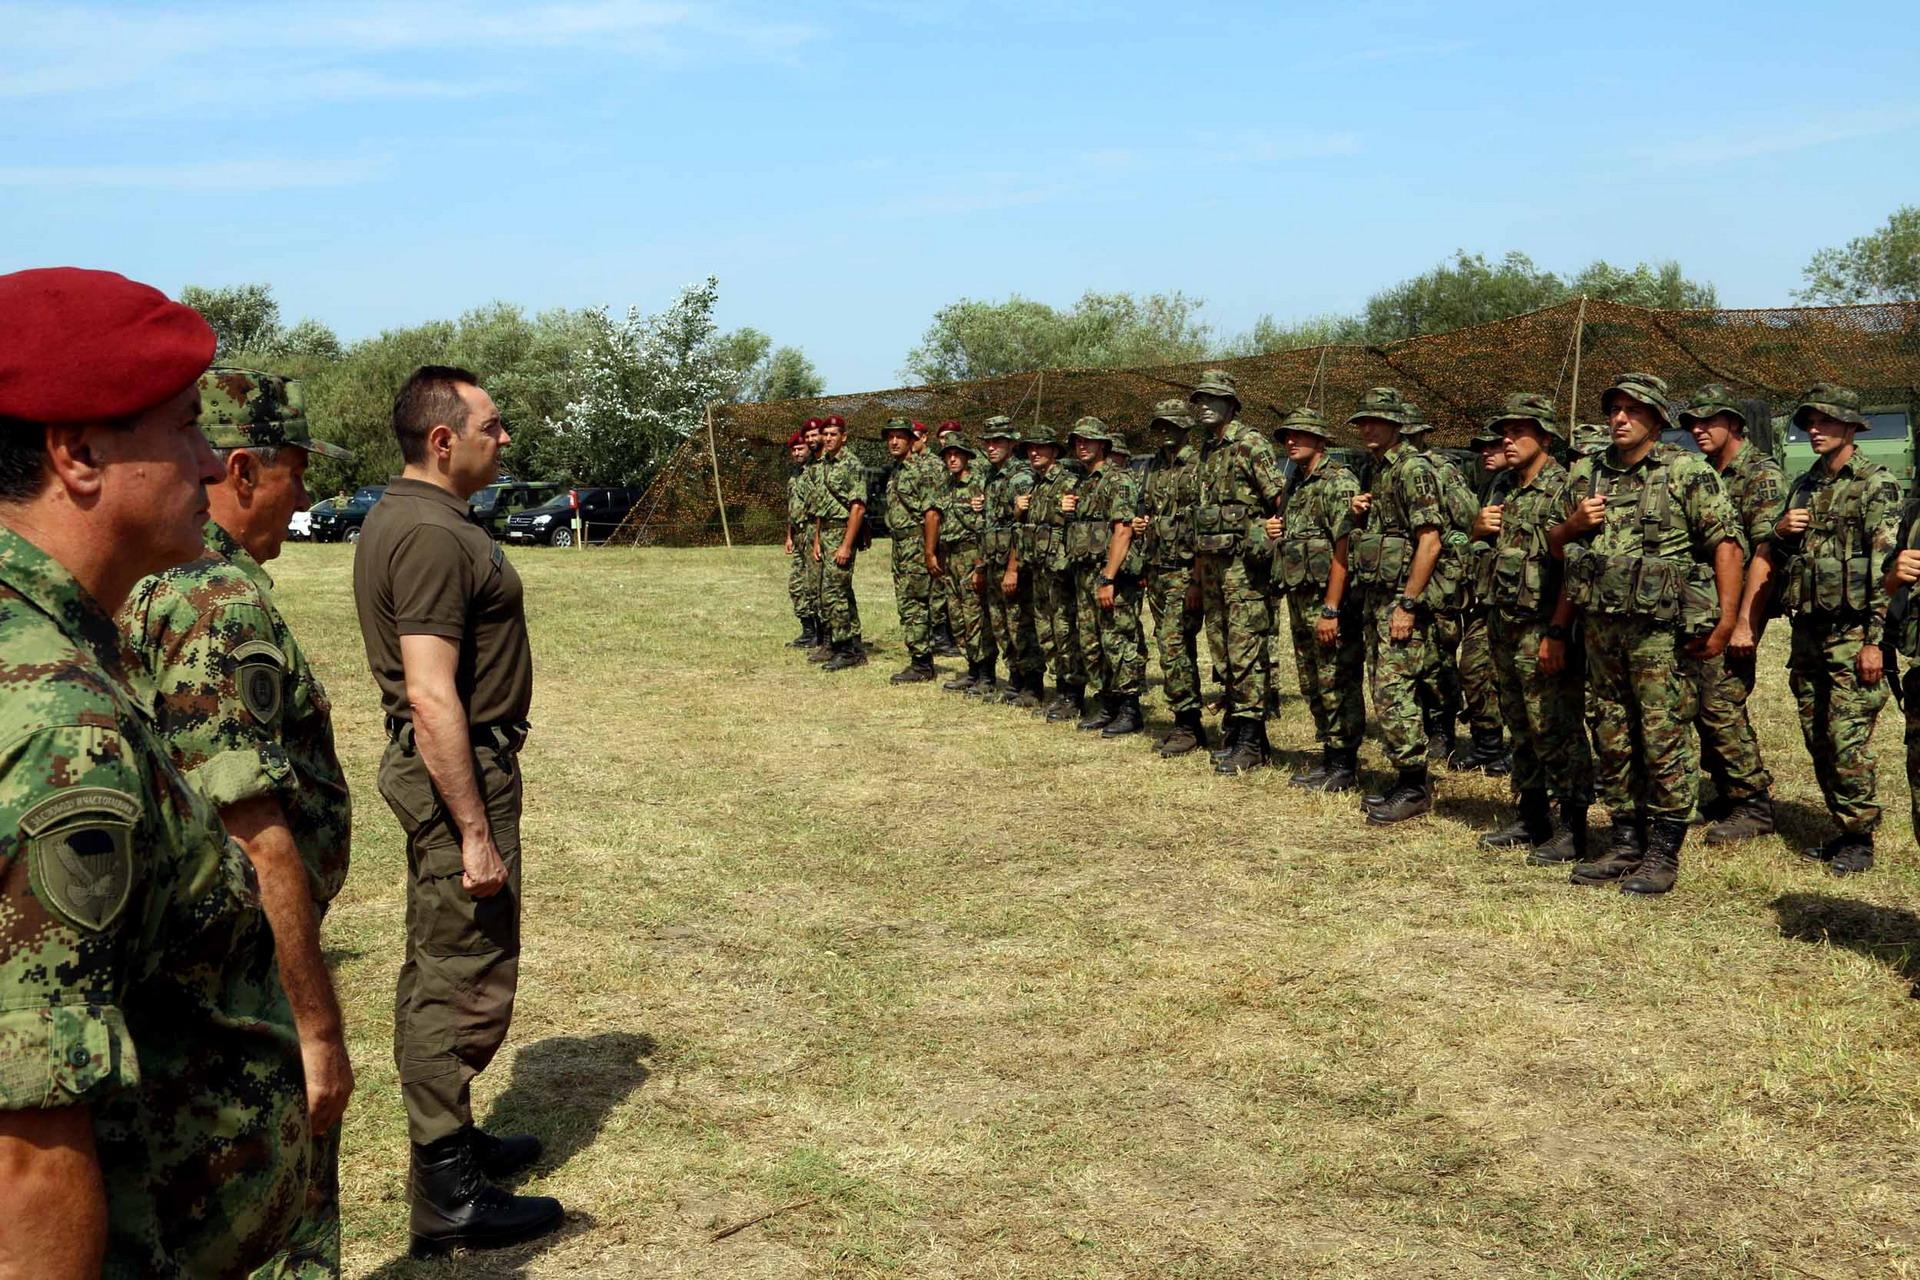 Ministar Vulin i general Diković obišli obuku 63. padobranskog bataljona, 24. avgusta 2018. godine u Deliblatskoj peščari | Foto Srđan Hajster, MC Odbrana